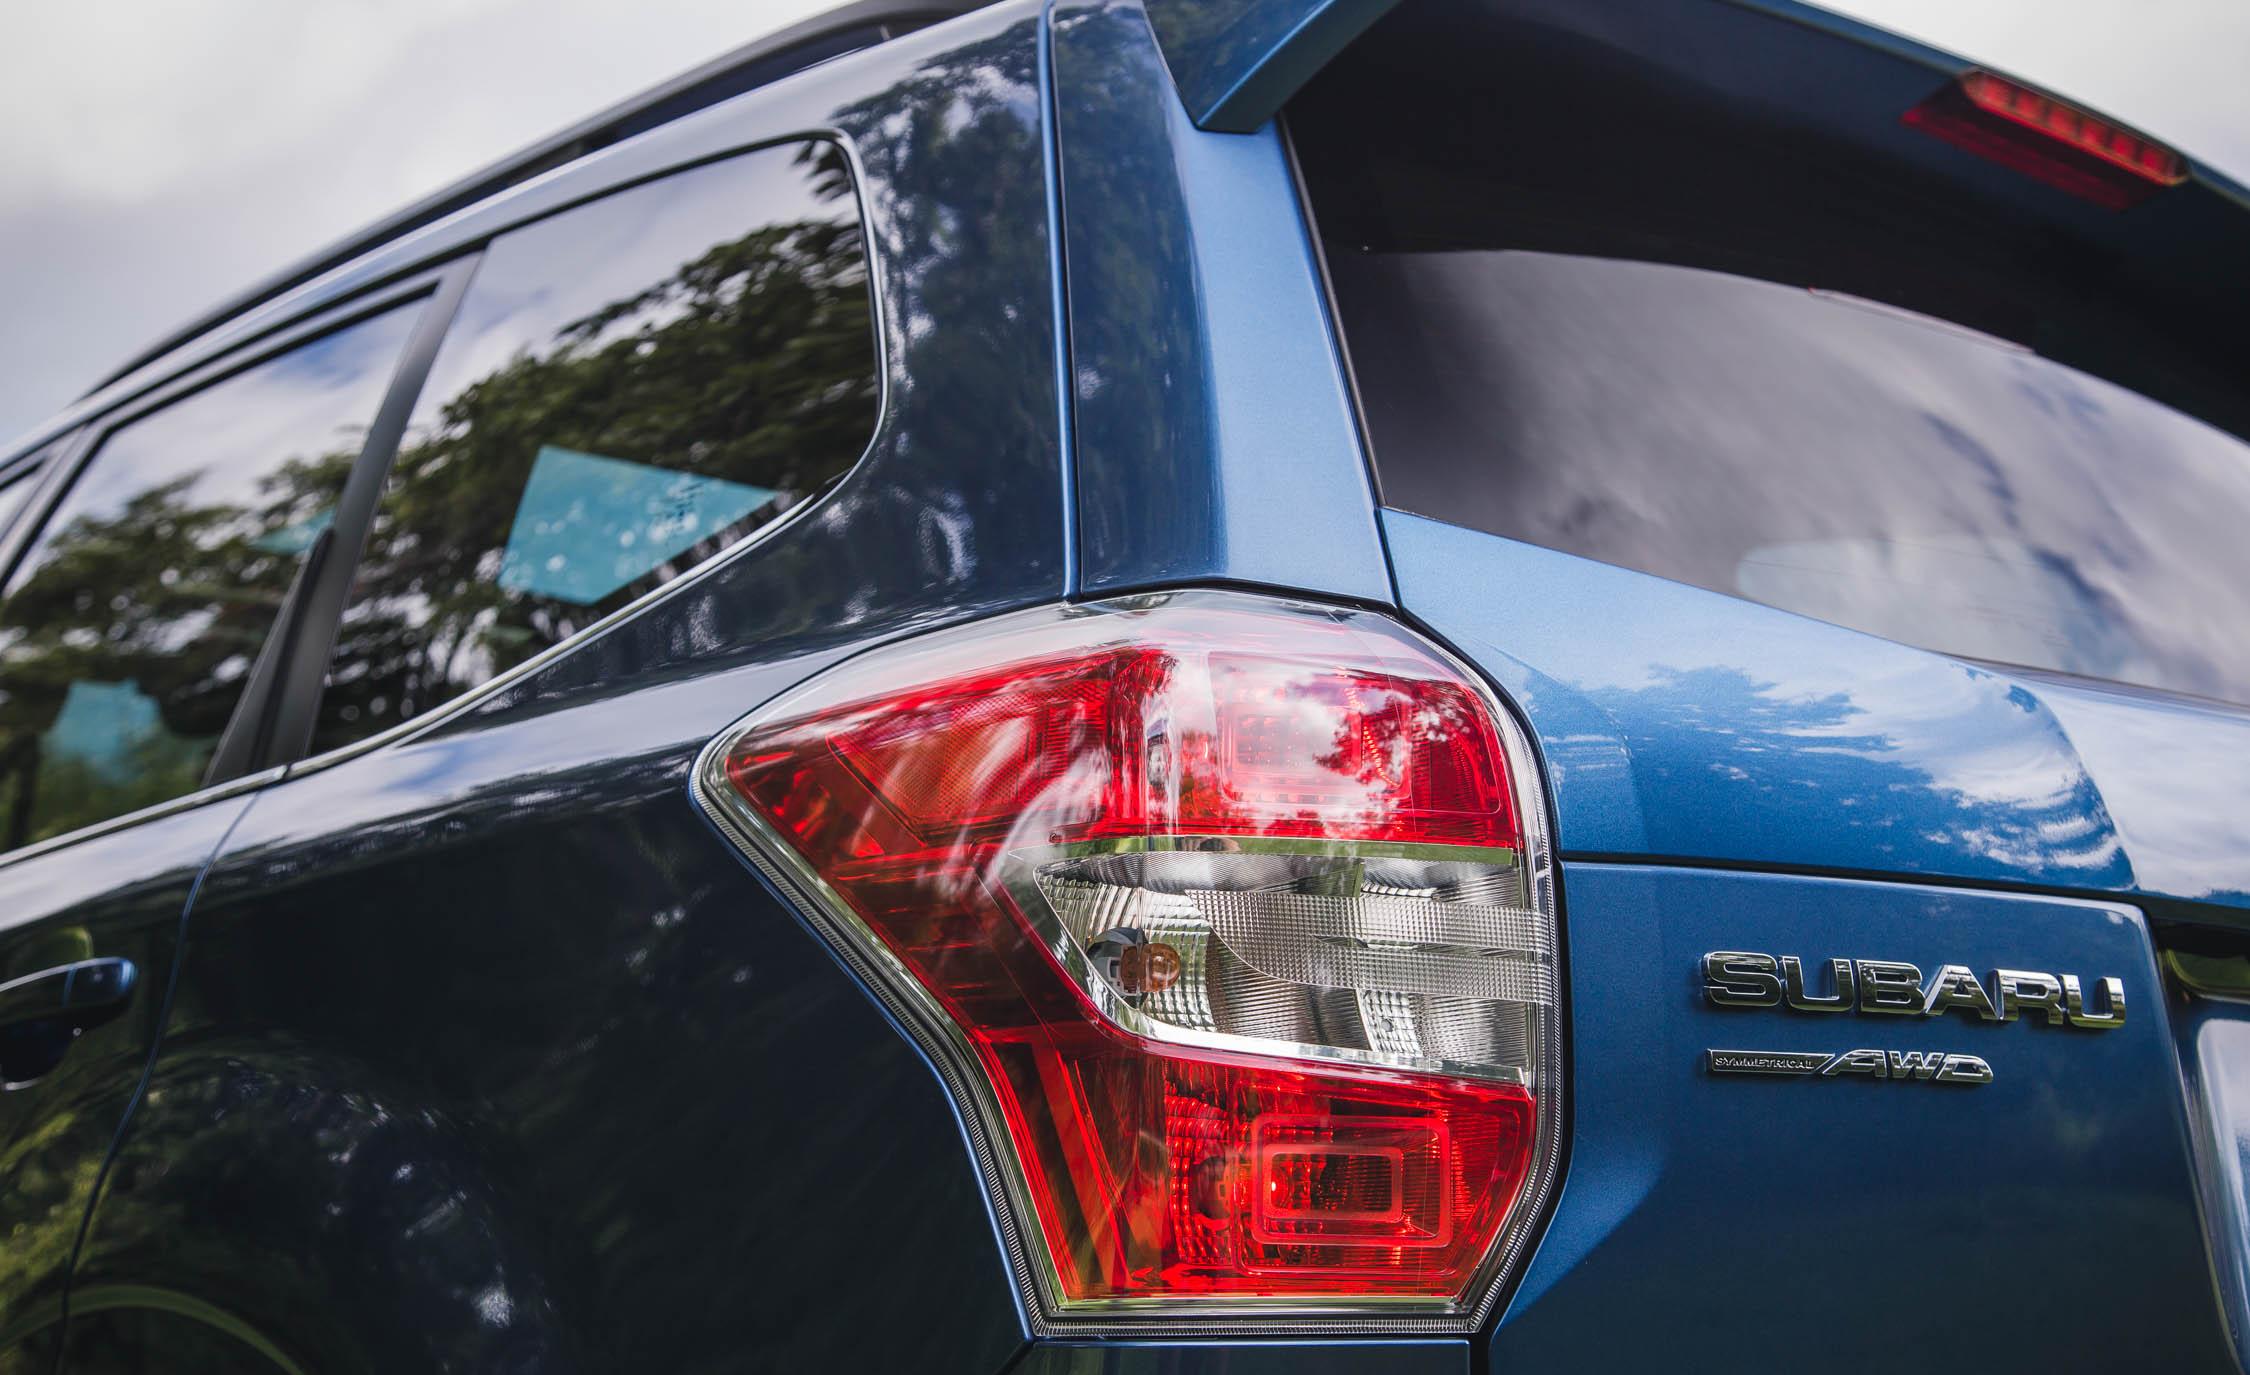 2016 Subaru Forester 2.0XT Touring Exterior Taillight Left